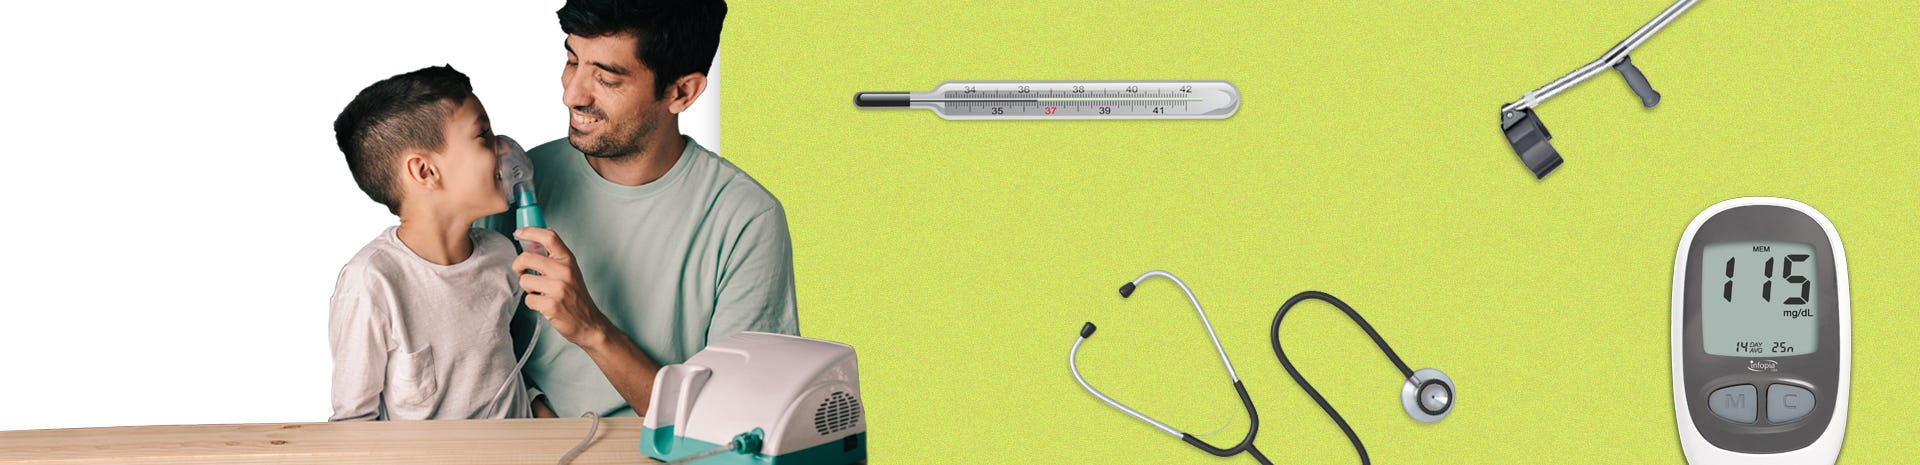 Medical Equipment AR